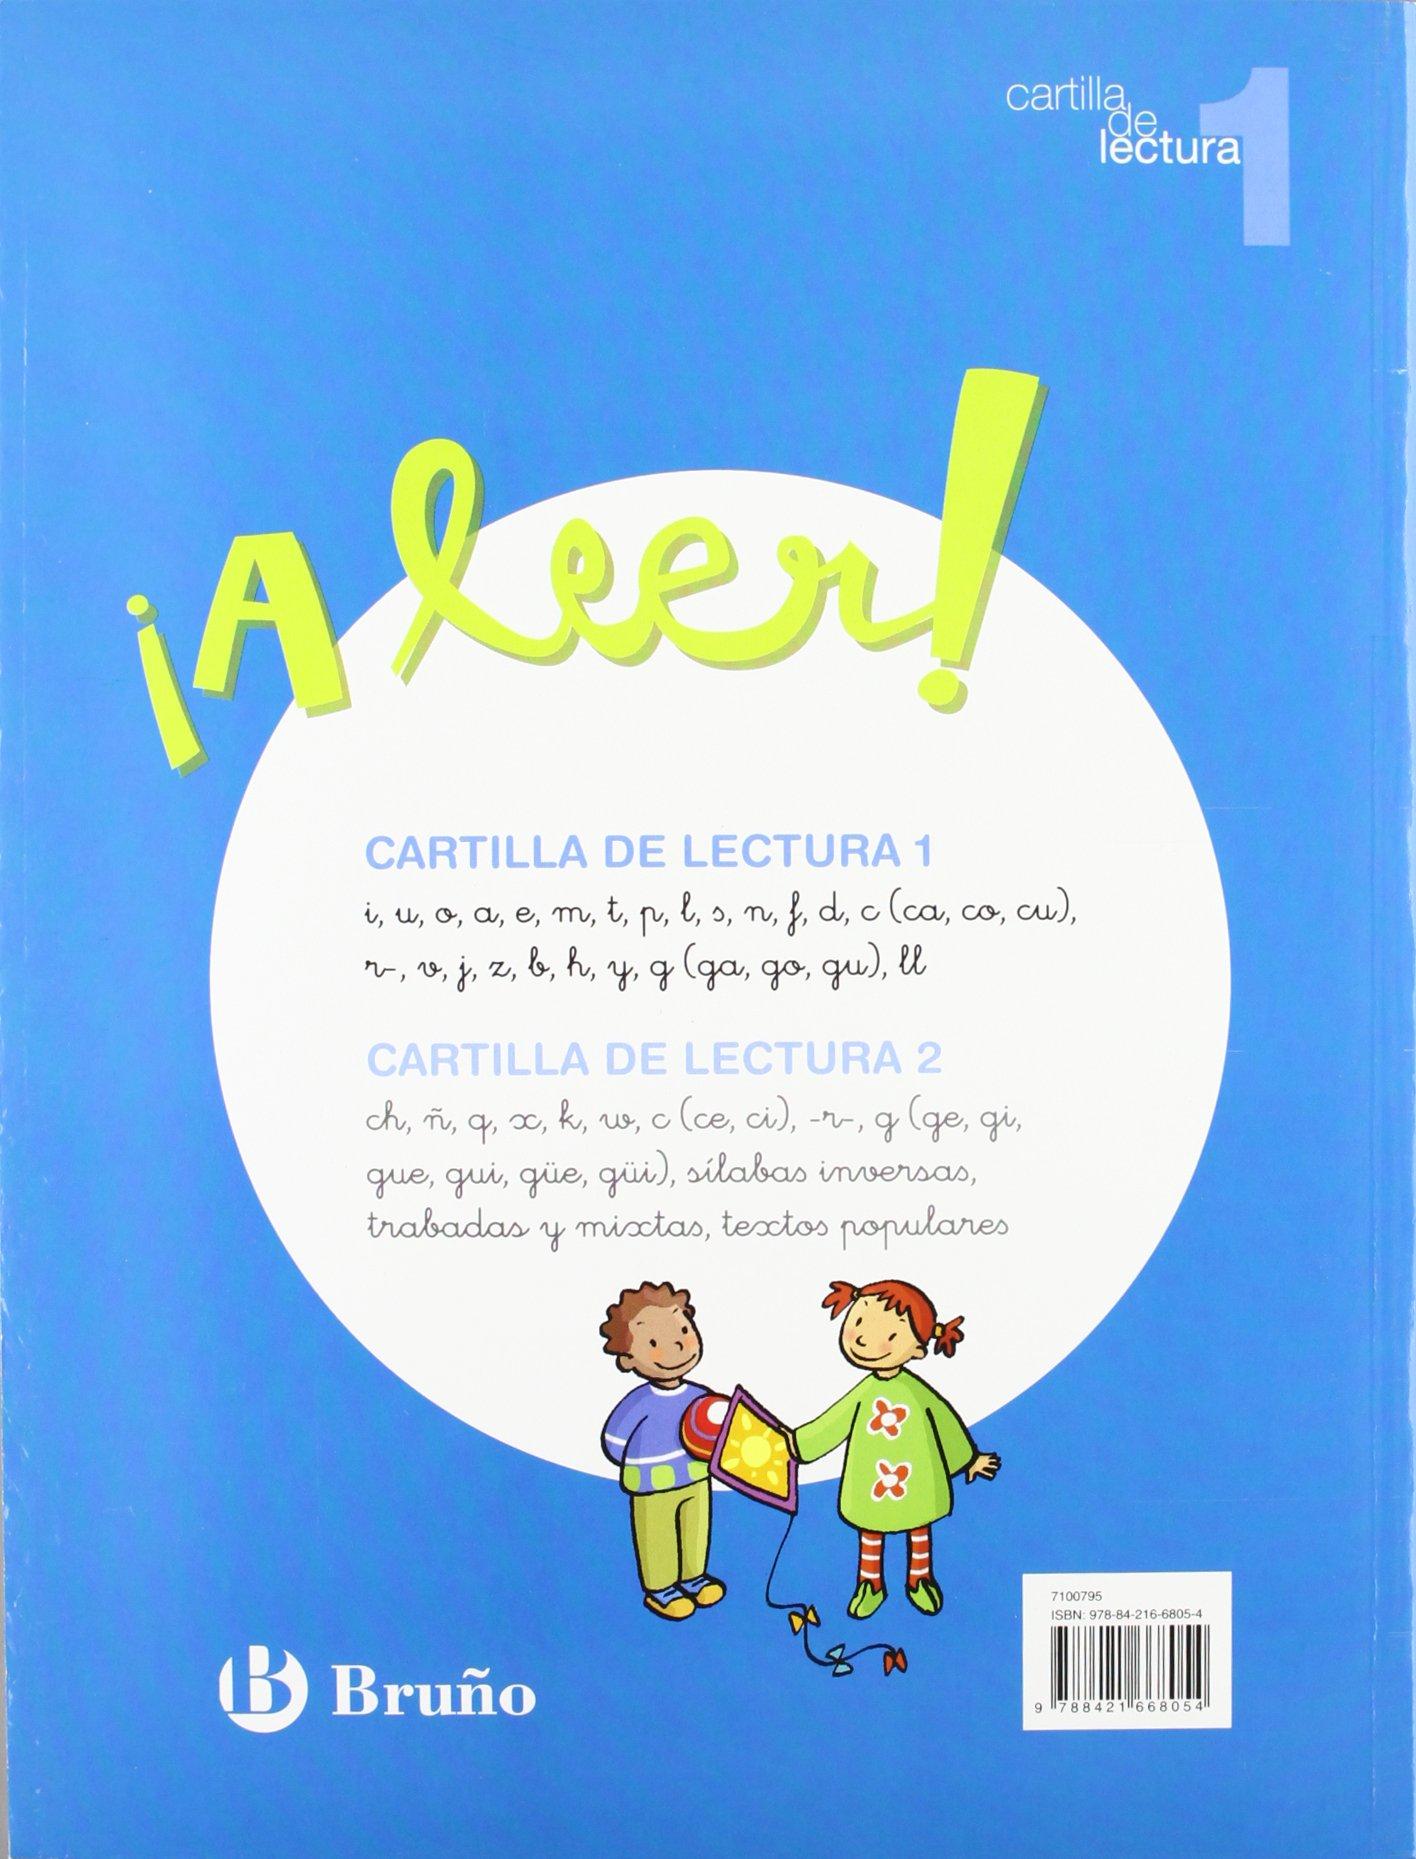 Cartilla 1 - 9788421668054: Edición 2010: Amazon.es: María Caparrós  González, Mª Teresa Lebrero Baena: Libros